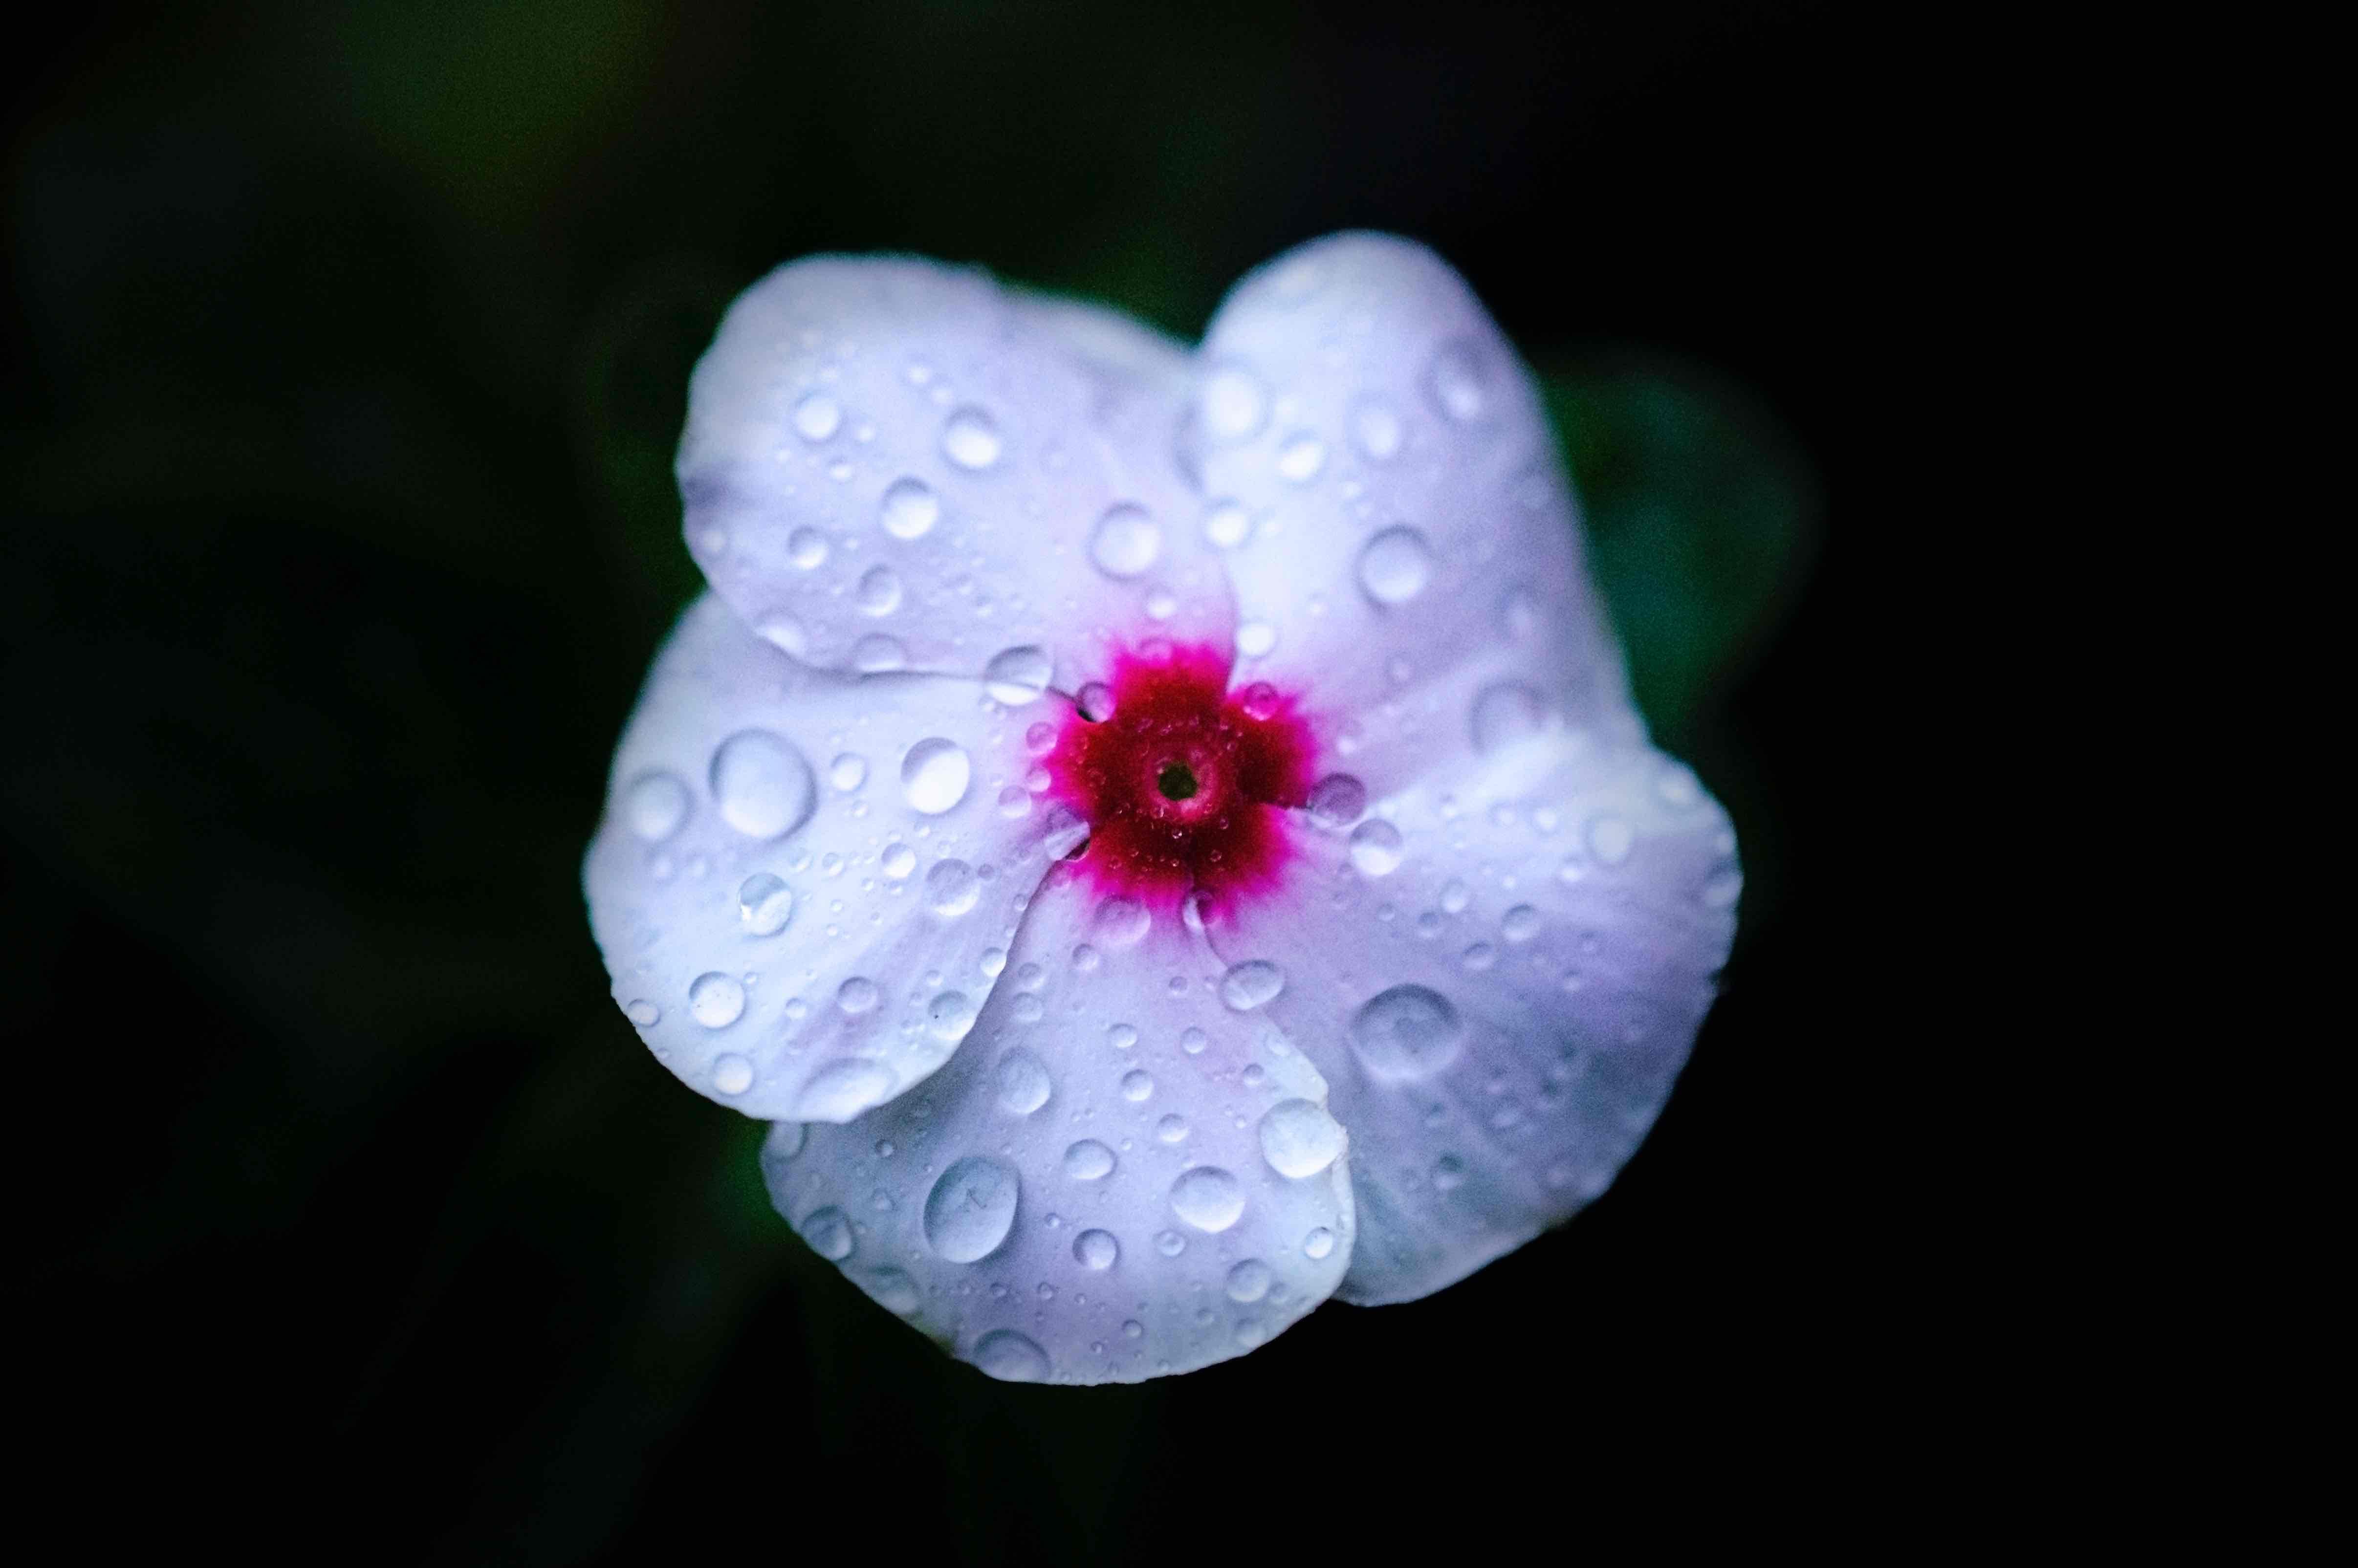 Imagenes muy lindas de flores4